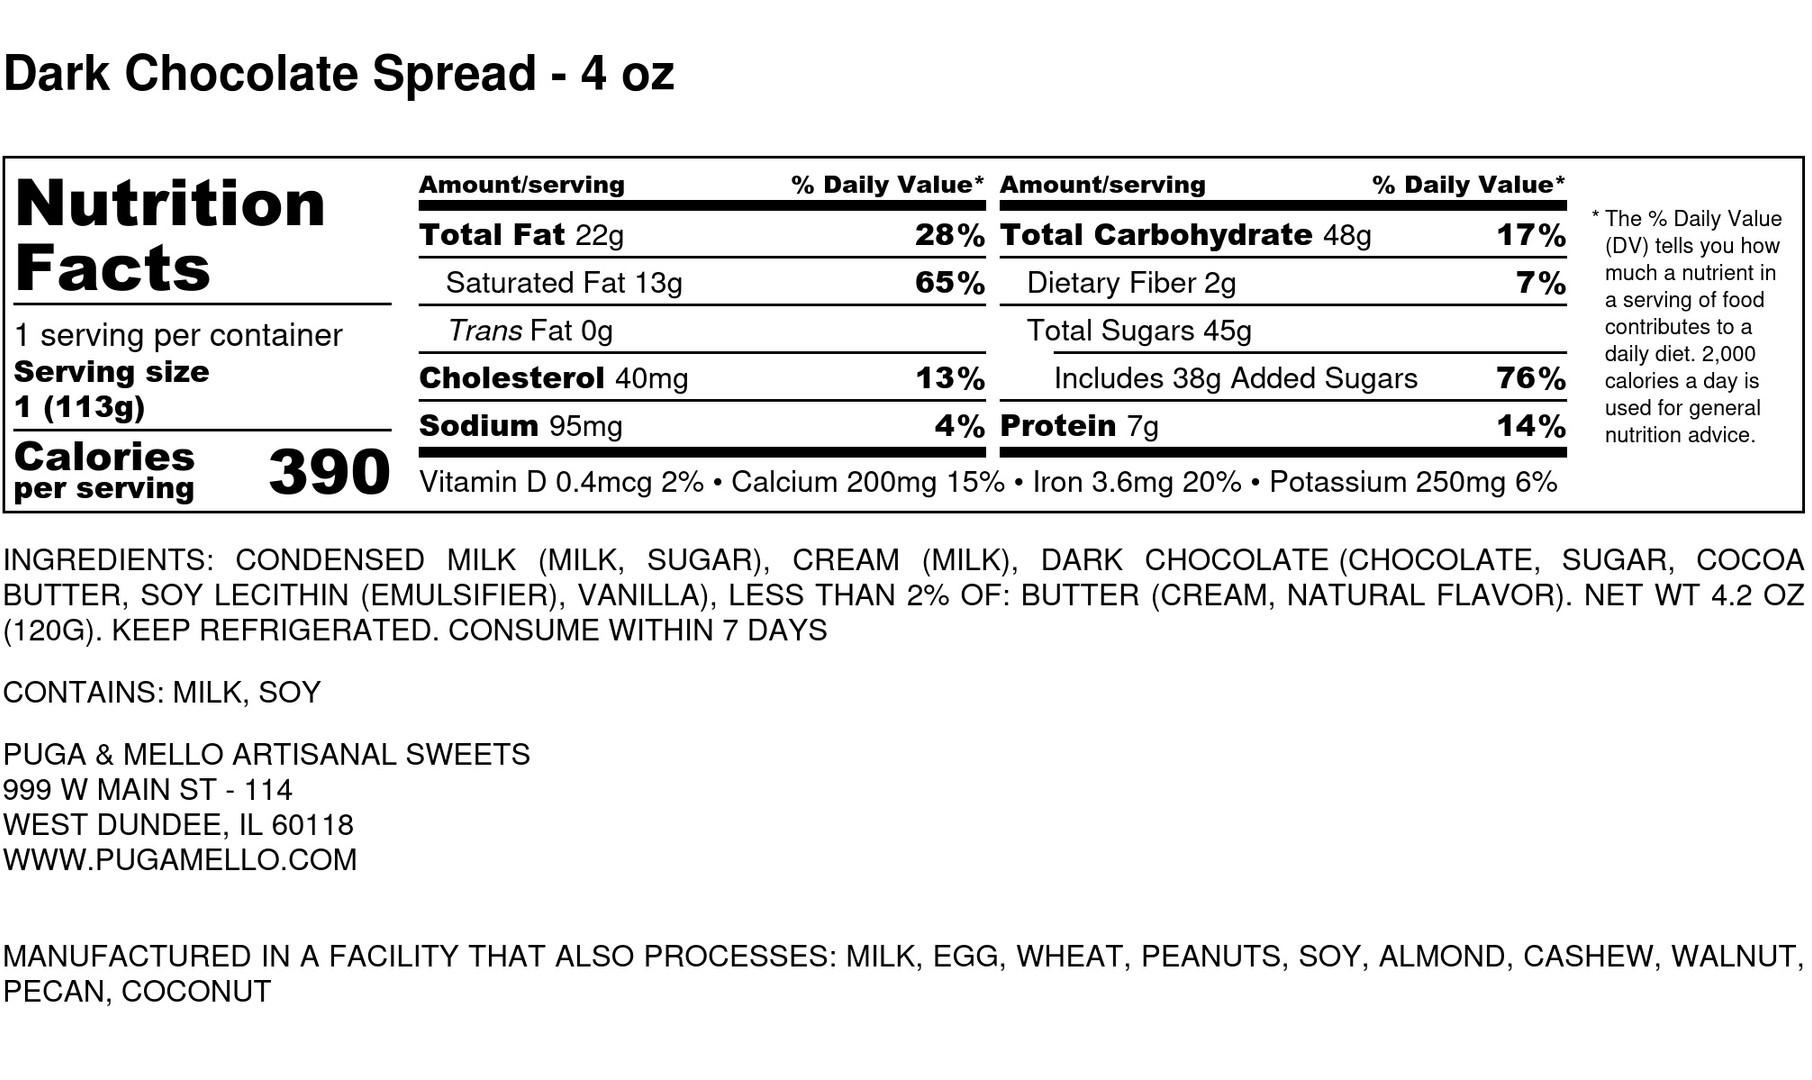 Dark Chocolate Spread - 4 oz - Nutrition